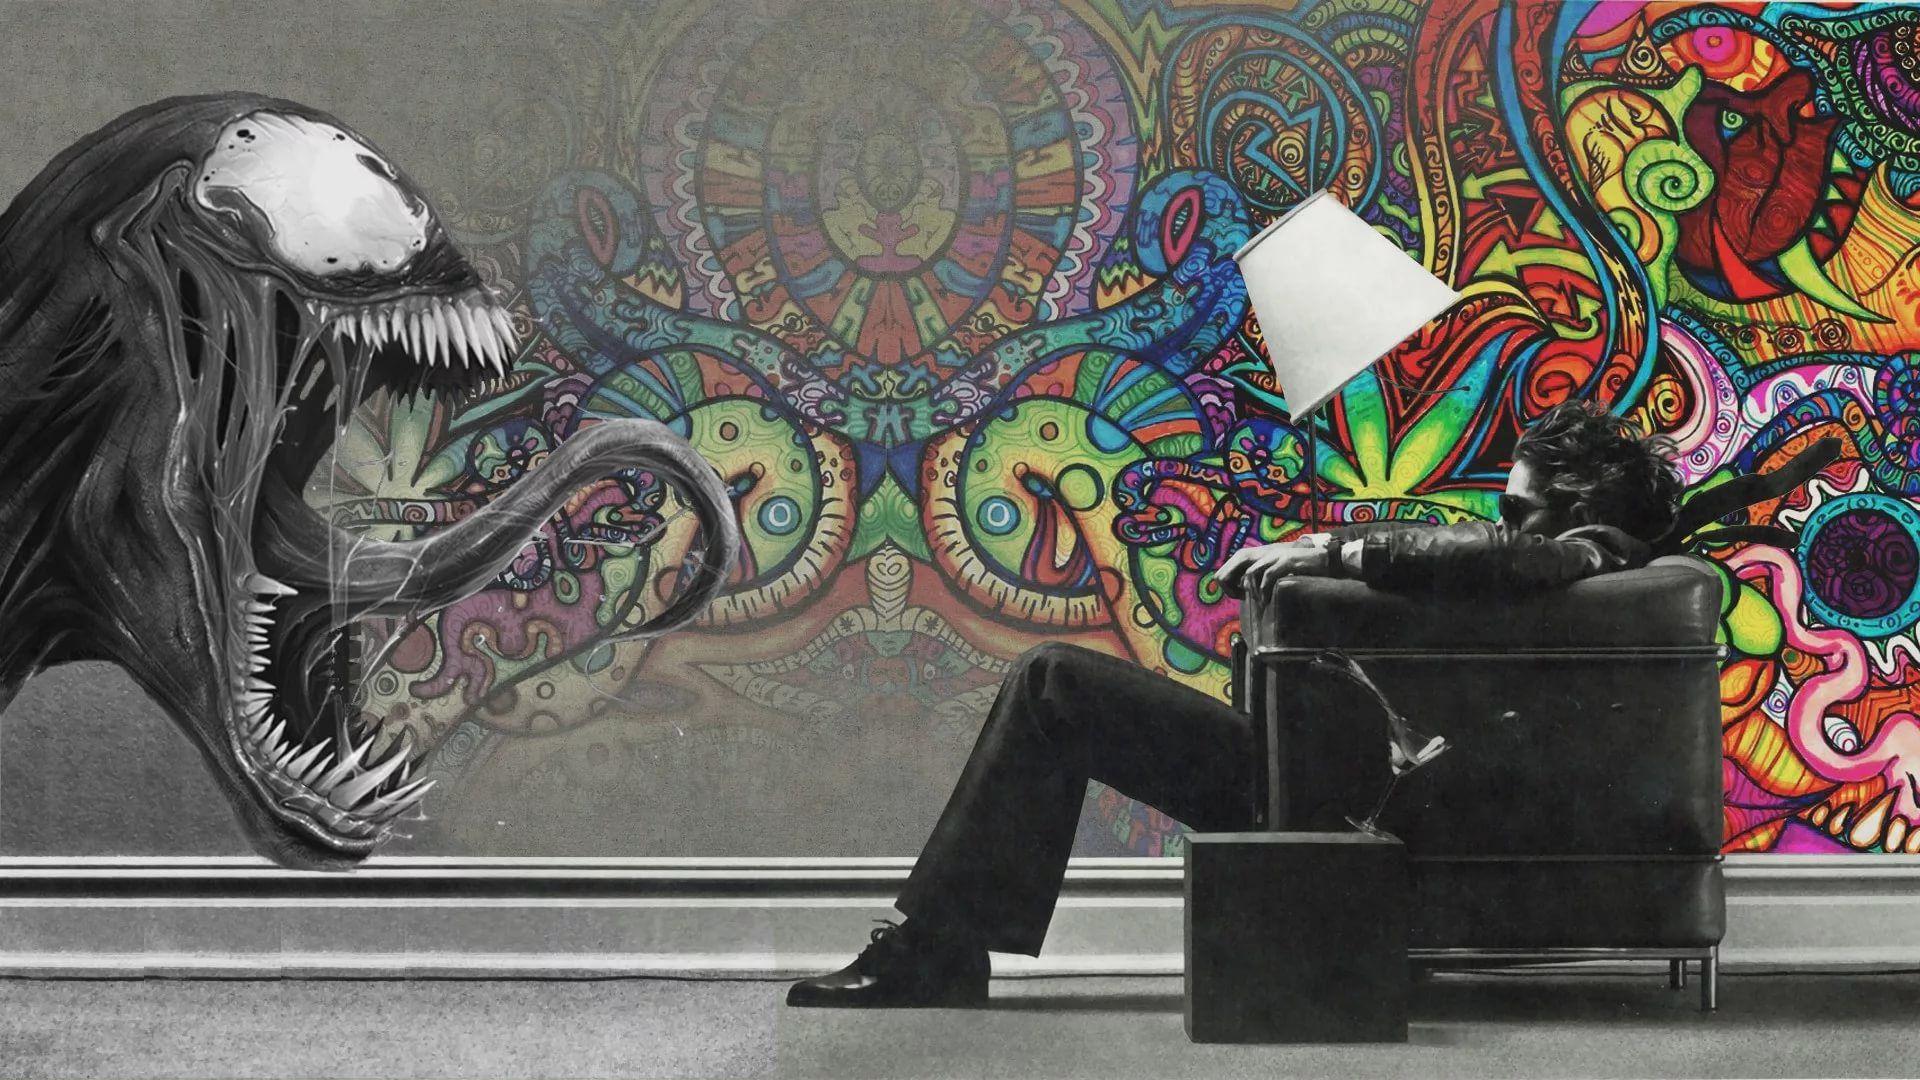 Sick Desktop laptop wallpaper